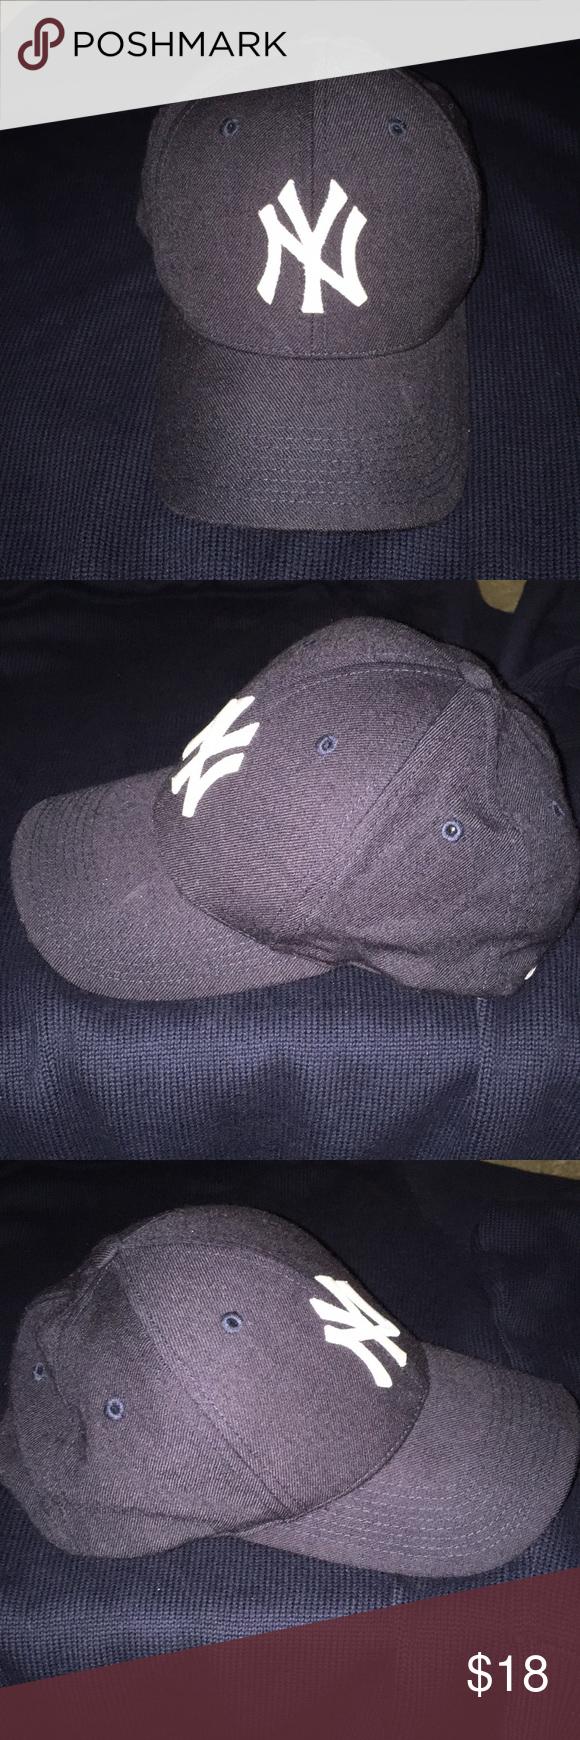 New York Yankees Nike Baseball Cap Baseball Cap New York Yankees Nike Accessories